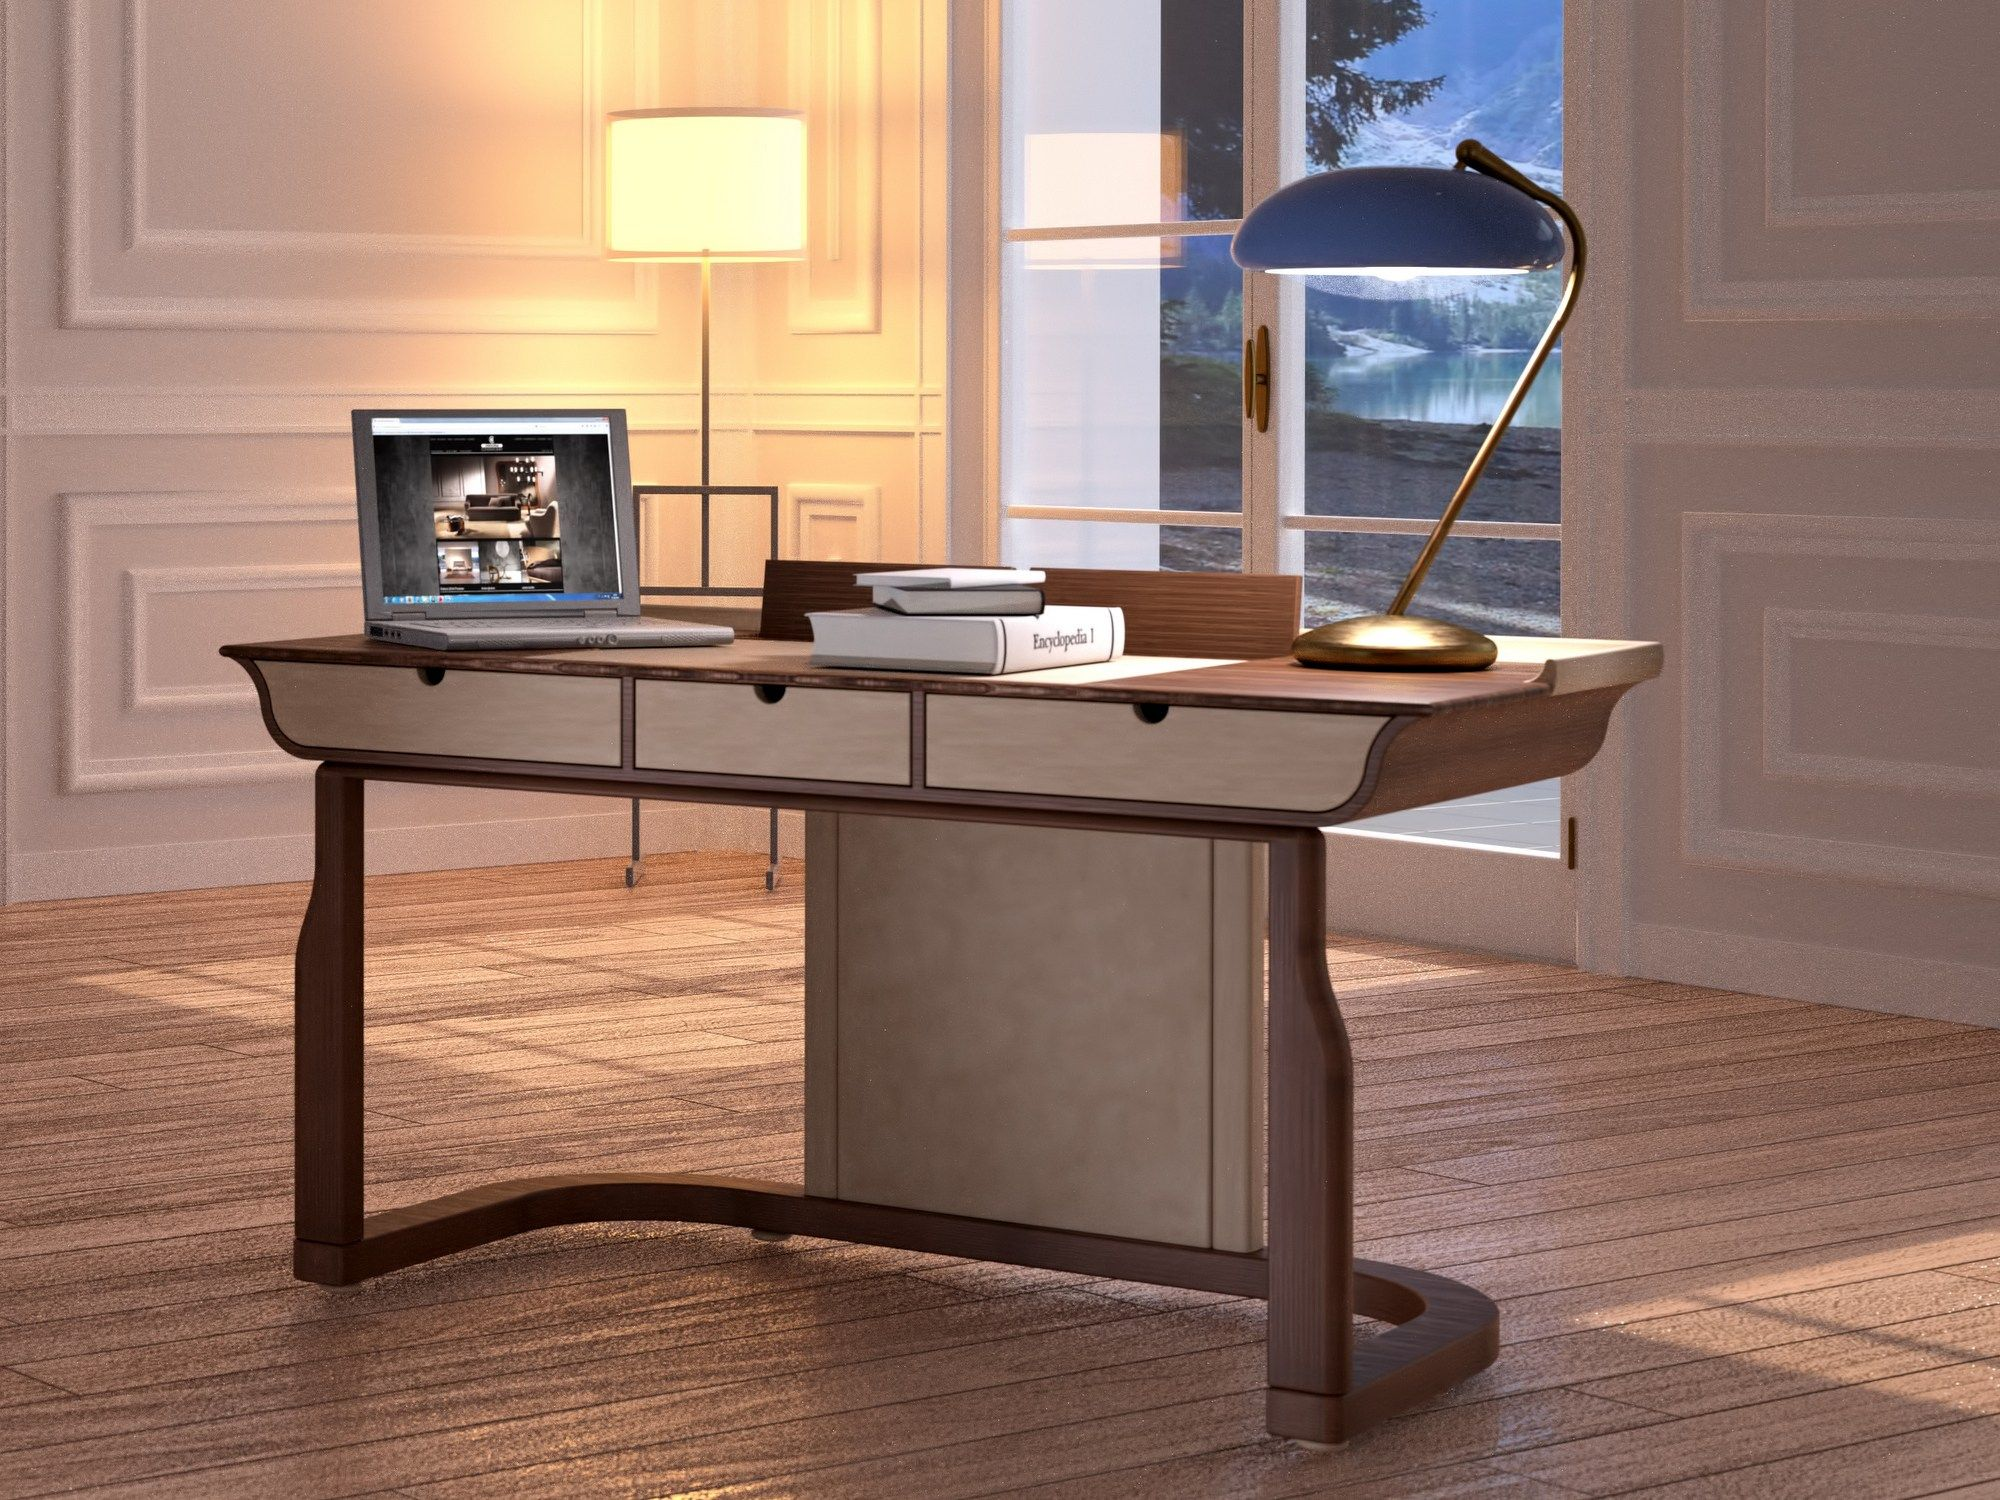 DESYO Secretary desk By Carpanelli Office desk